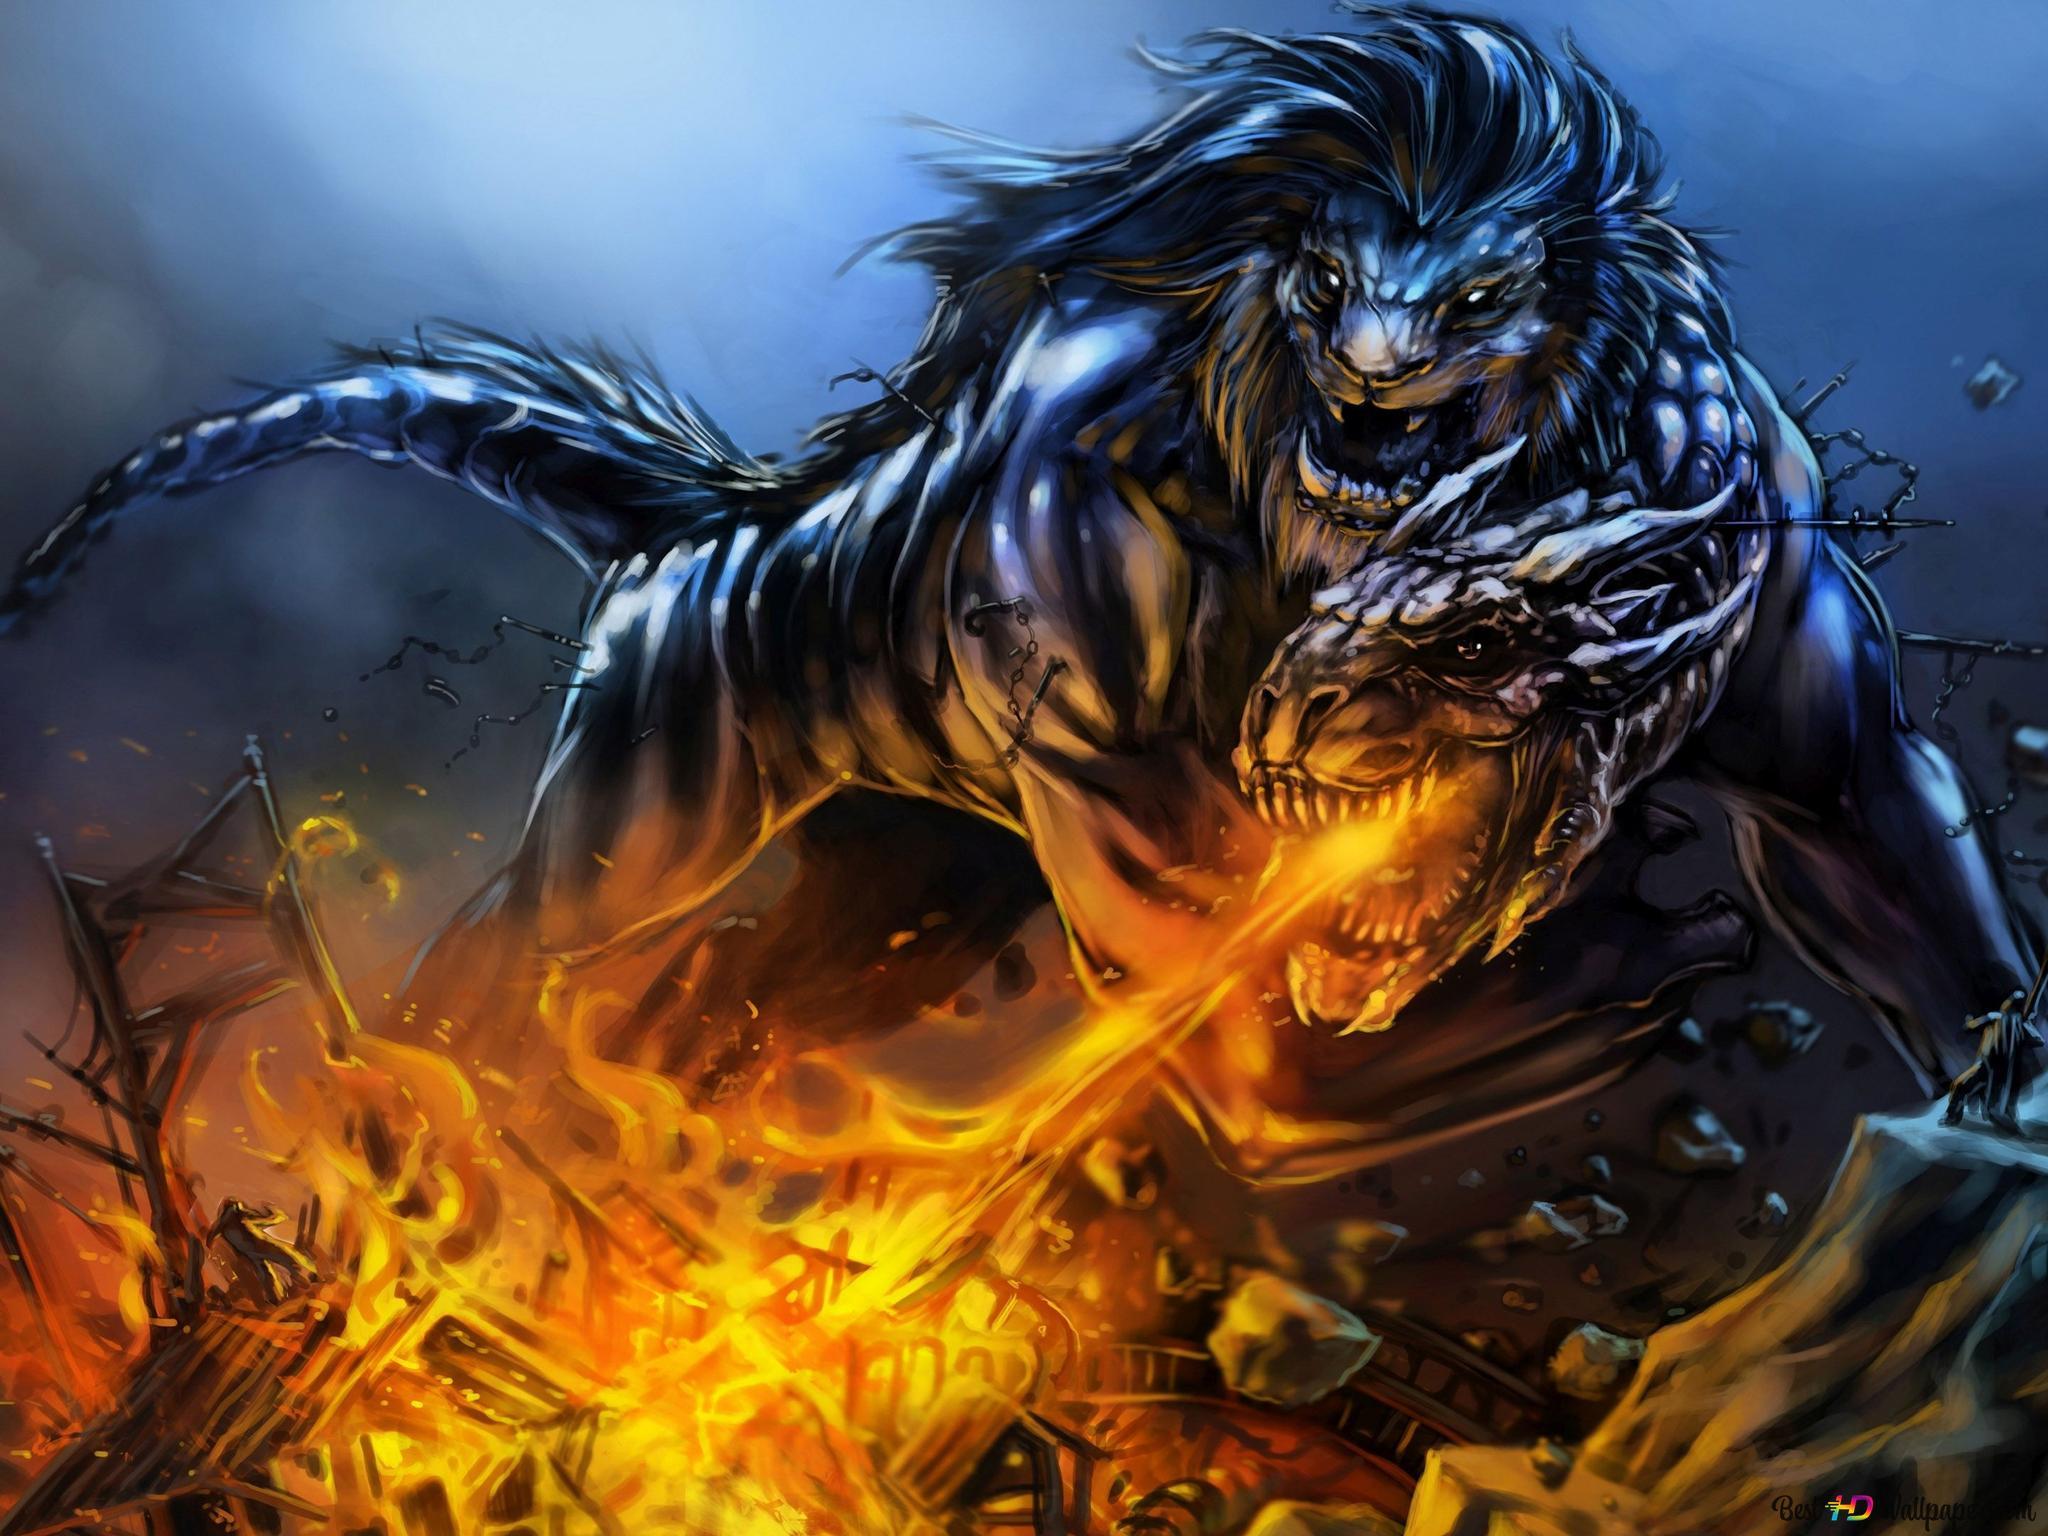 fantasy dragon and lion wallpaper 2048x1536 11683 26